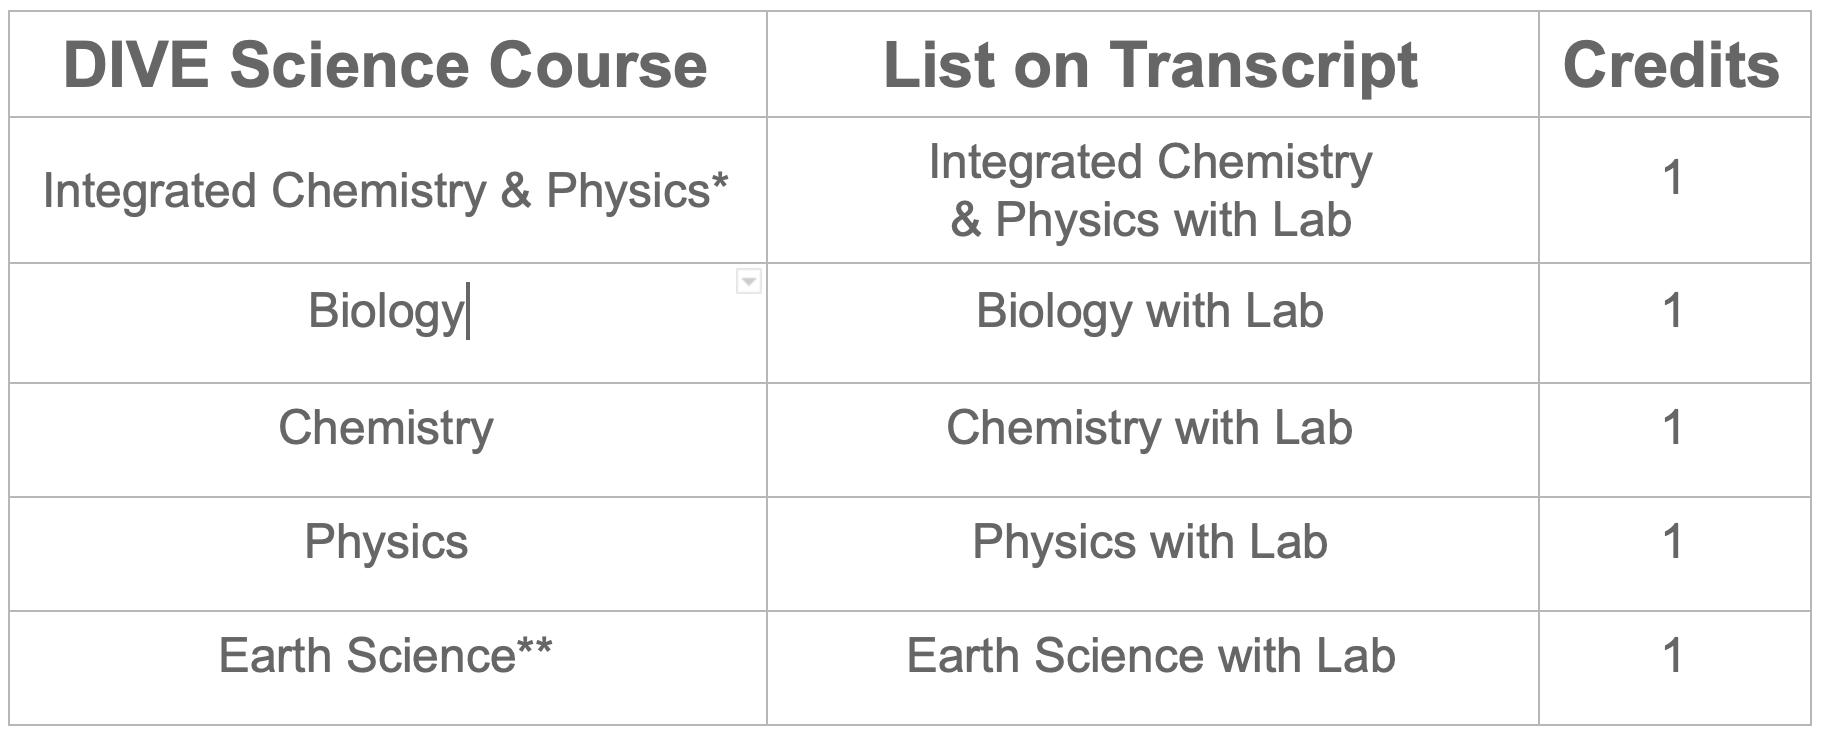 credits-science-rev-1.png